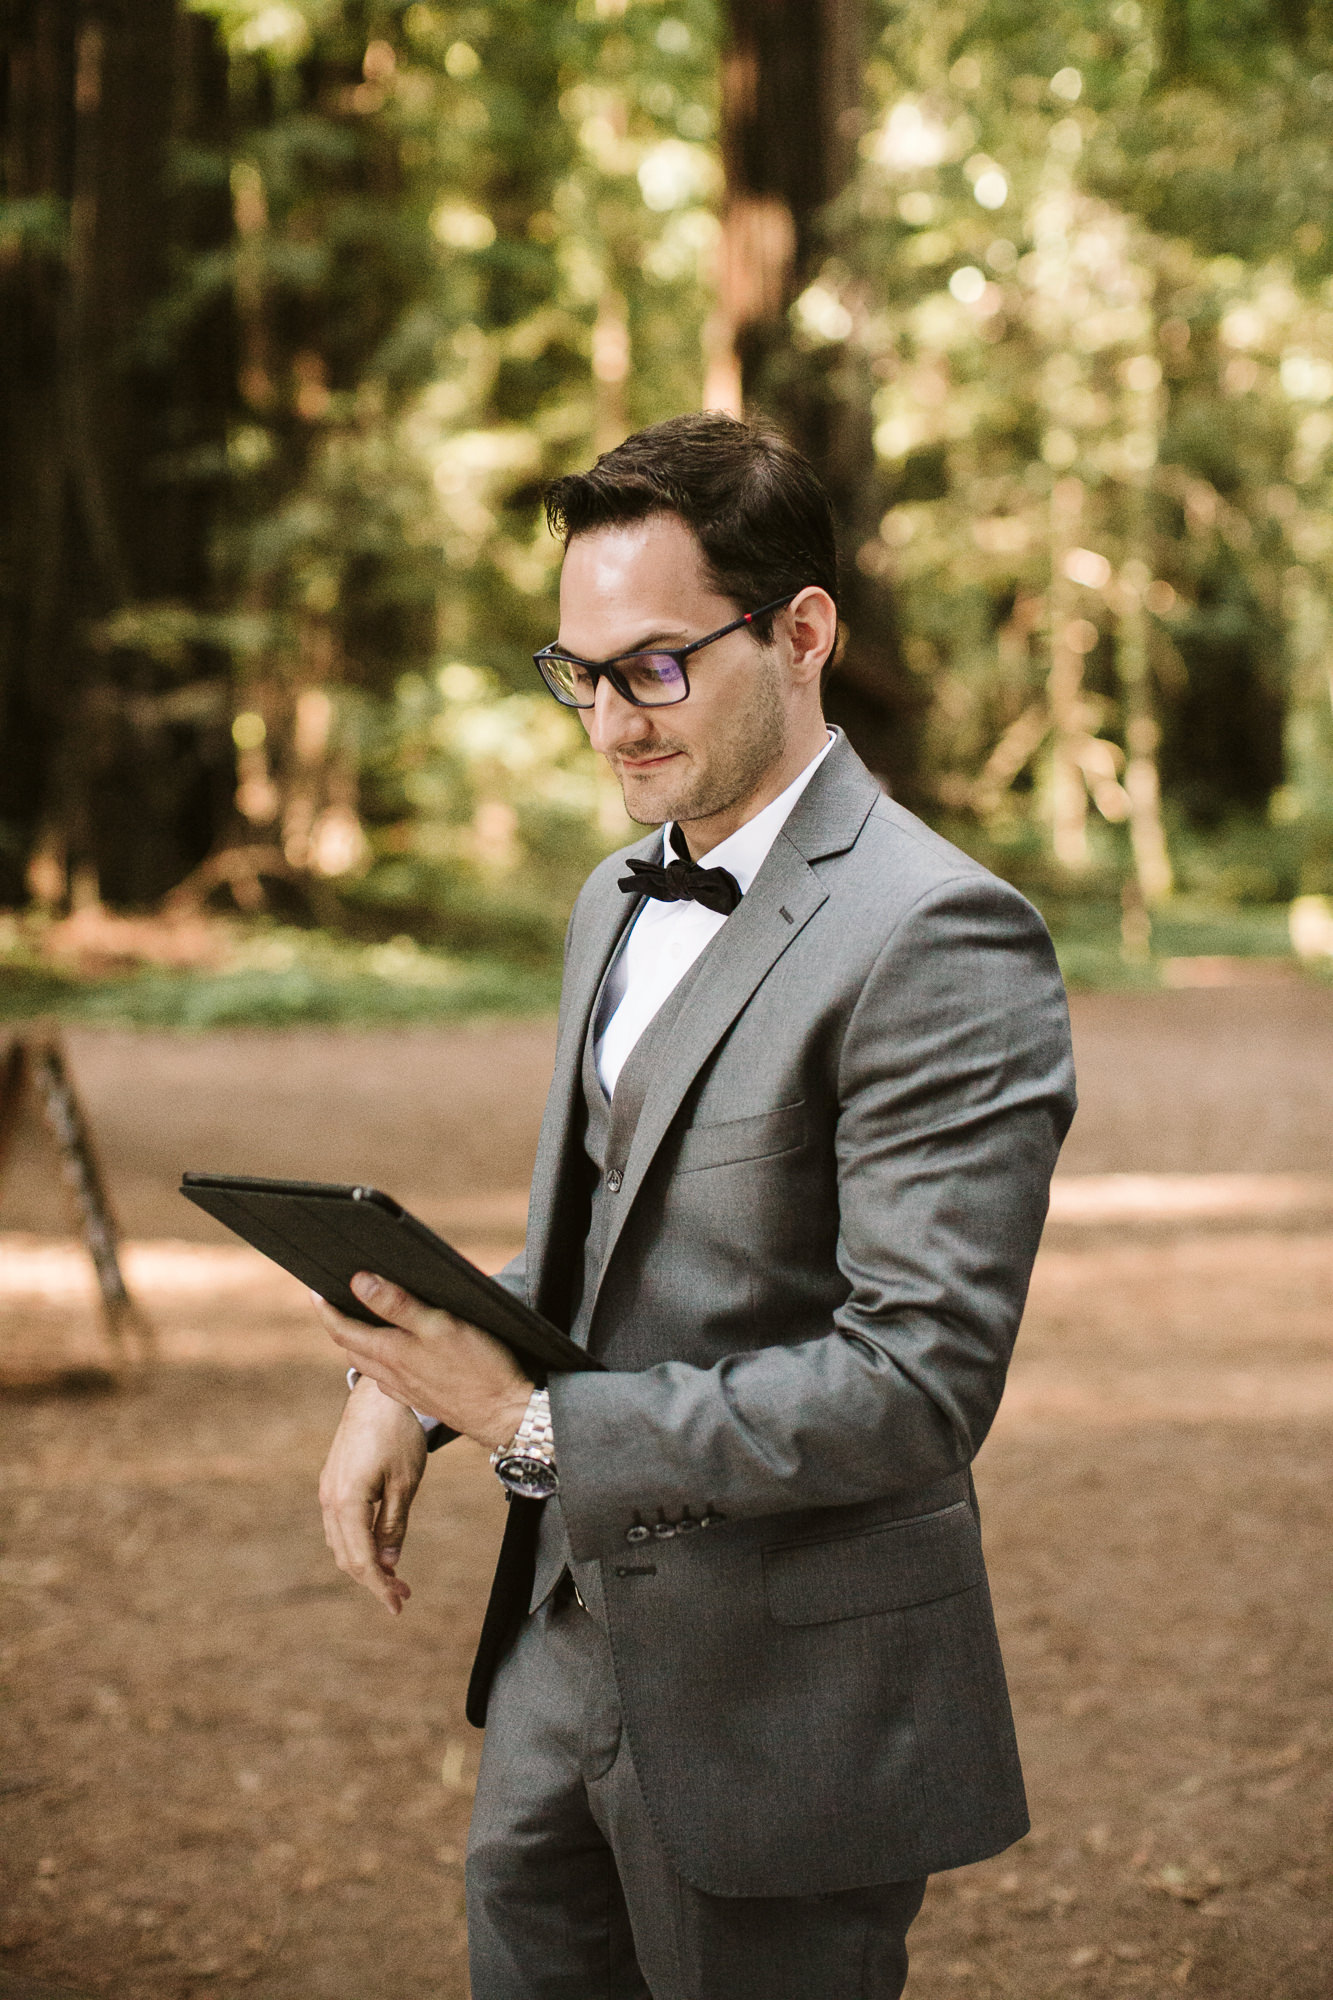 California-wedding-photographer-alfonso-flores-pamplin-groove-317.jpg